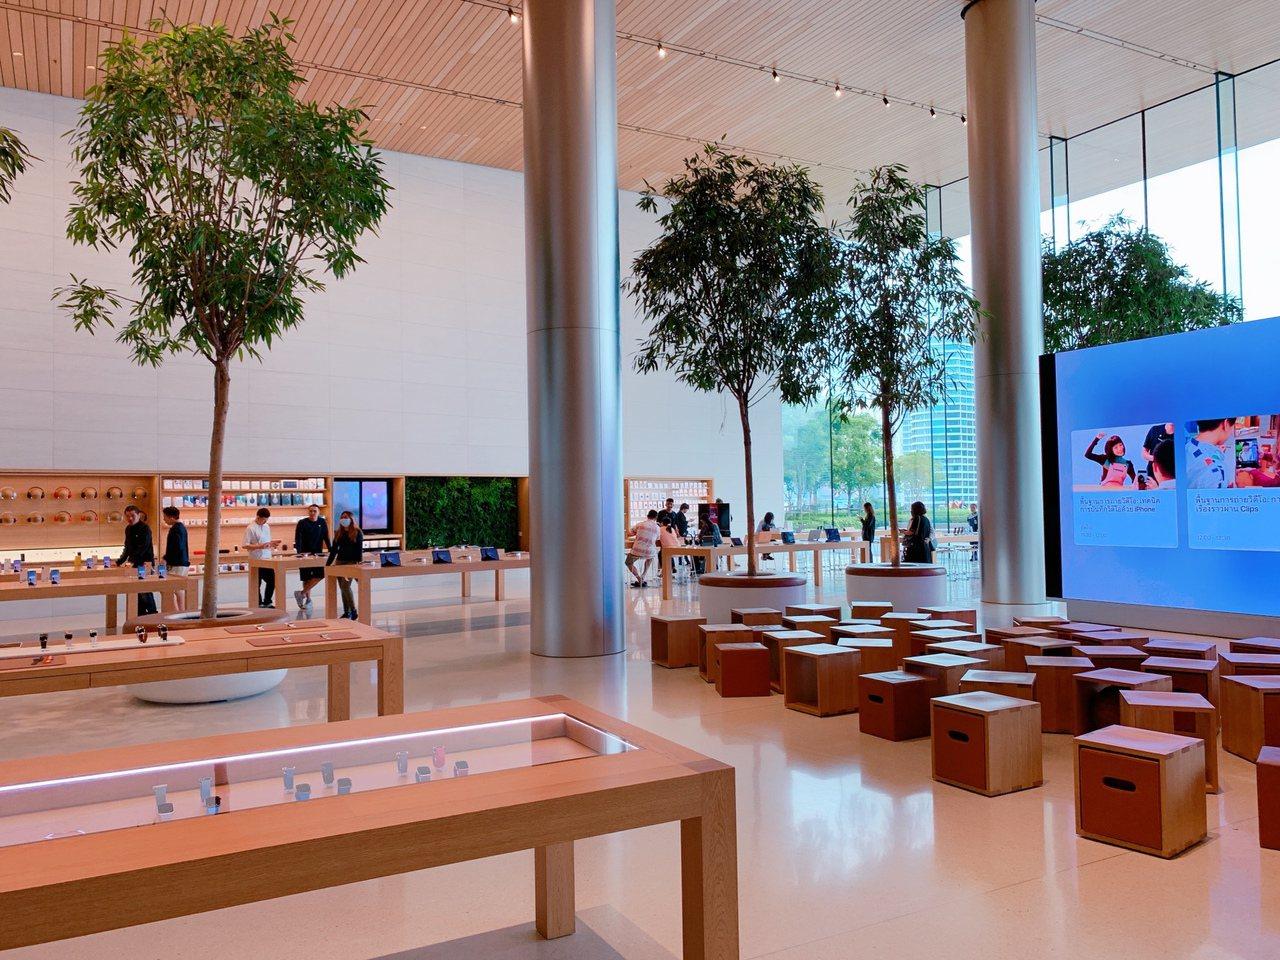 Apple旗艦店室內寬敞舒適,提供絕佳商品選購環境。記者徐力剛/攝影